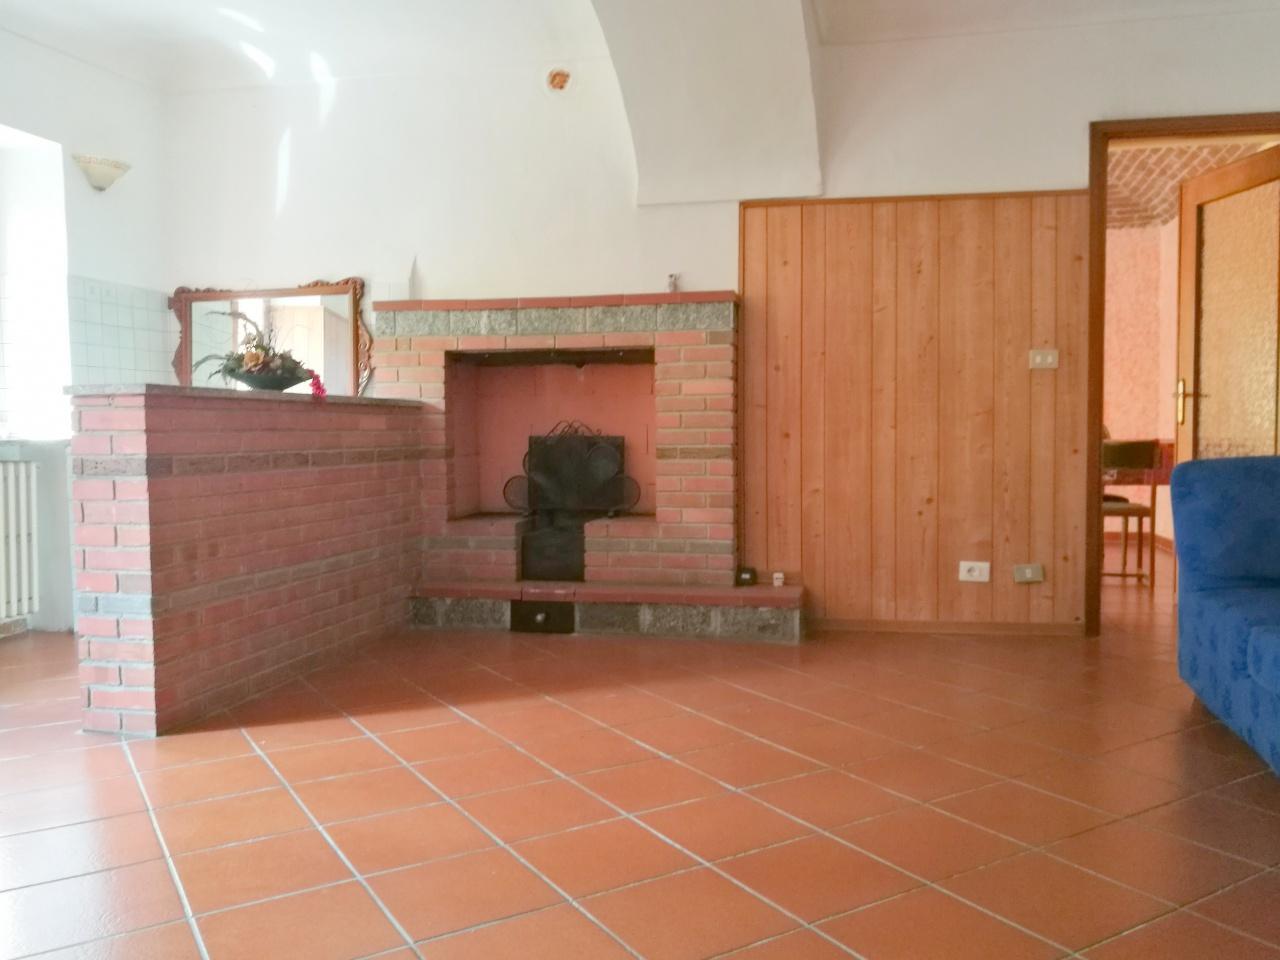 CASA INDIPENDENTE in VENDITA a RONDISSONE